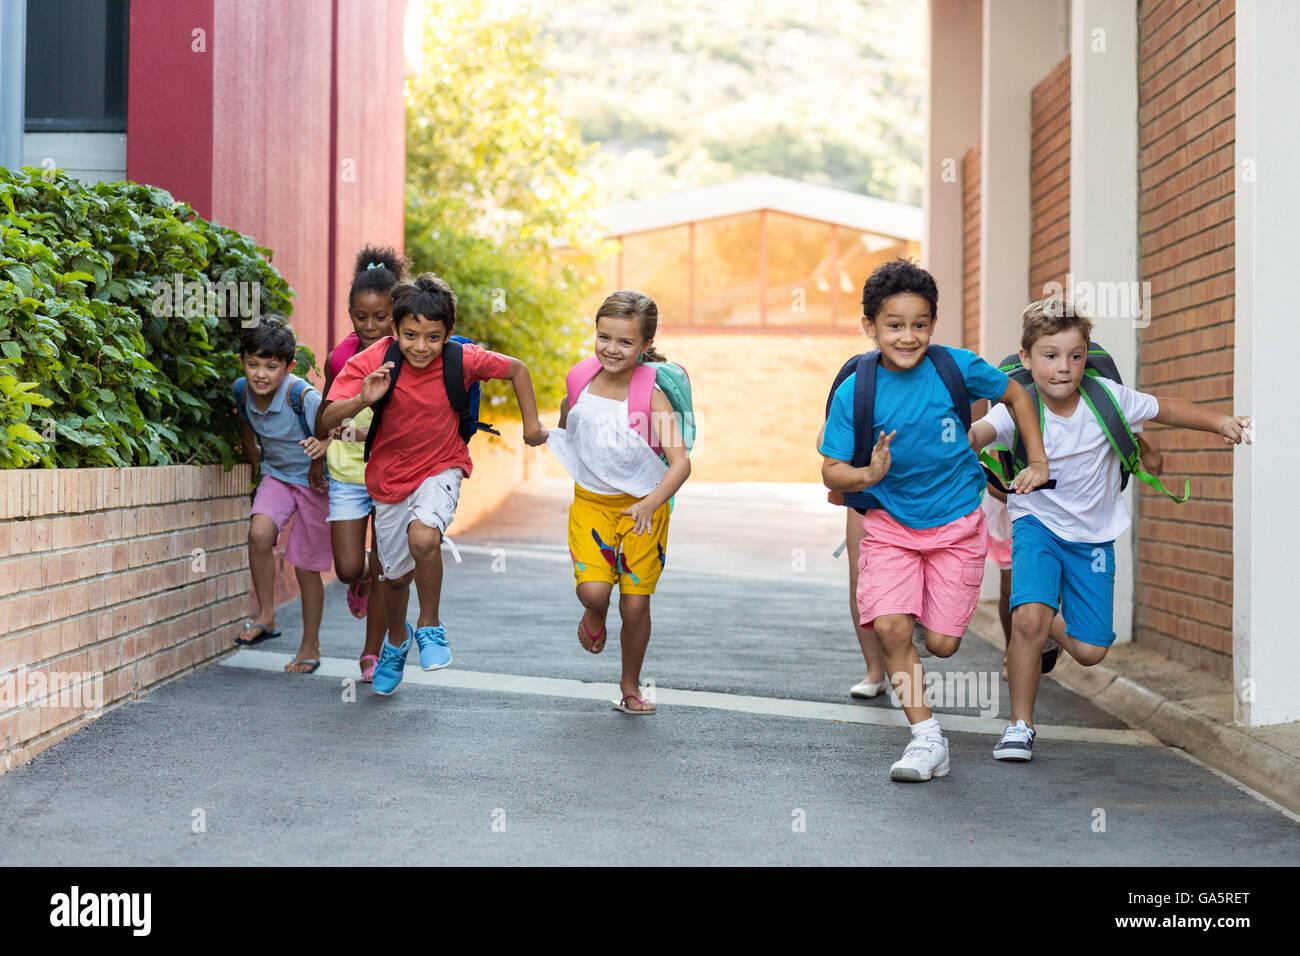 Schoolchildren running on footpath - Stock Image